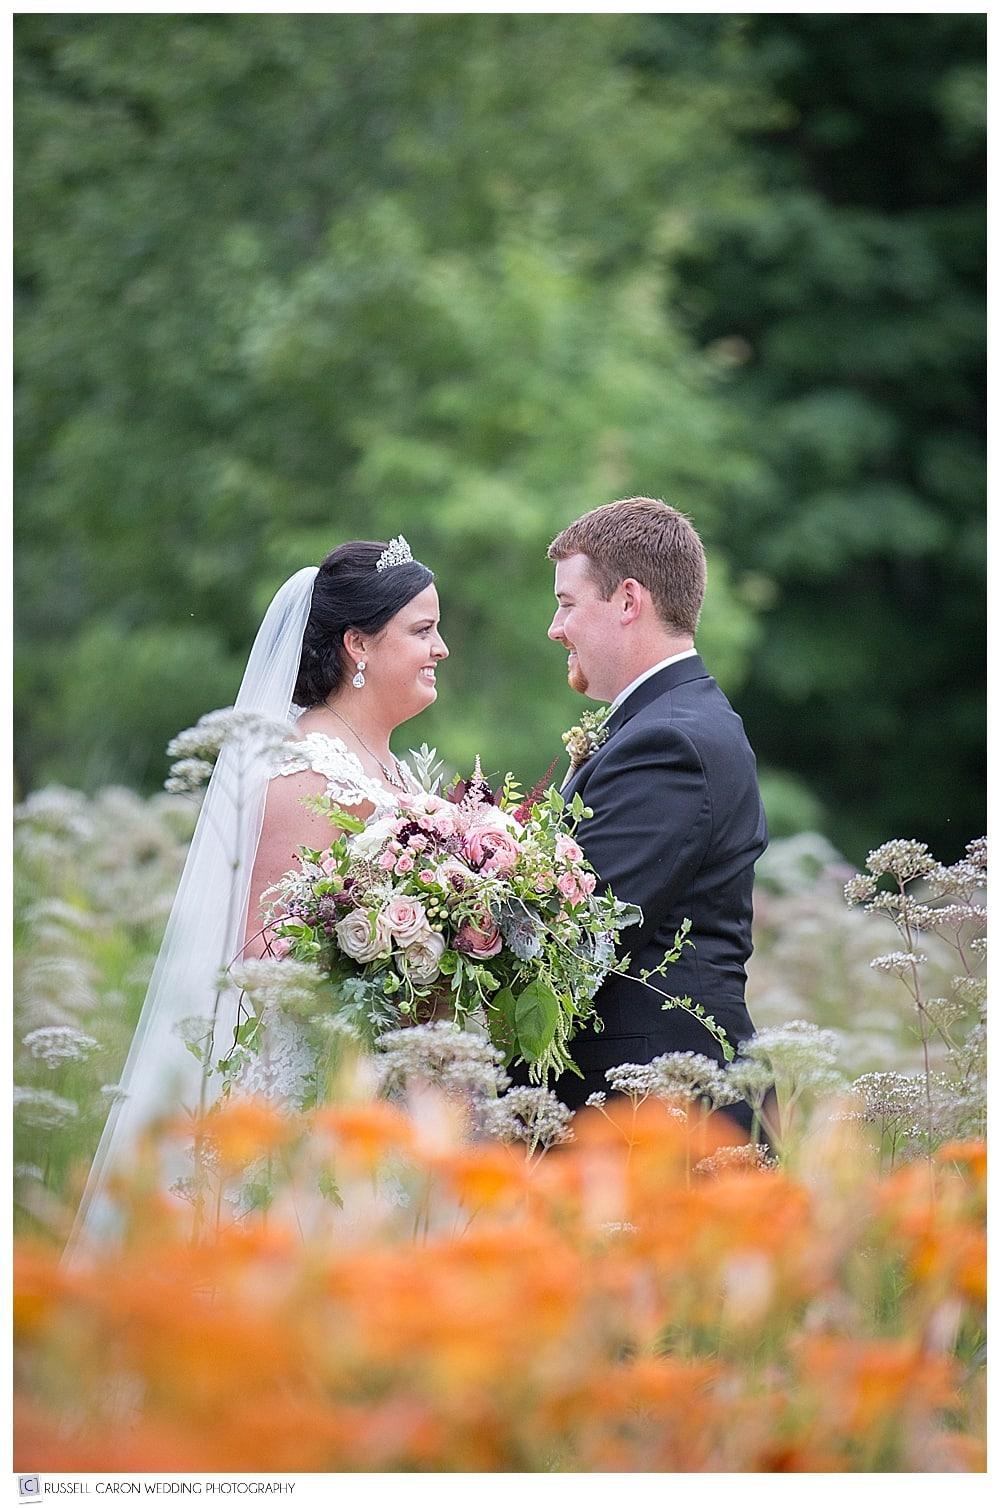 bride-and-groom-amid-flowers